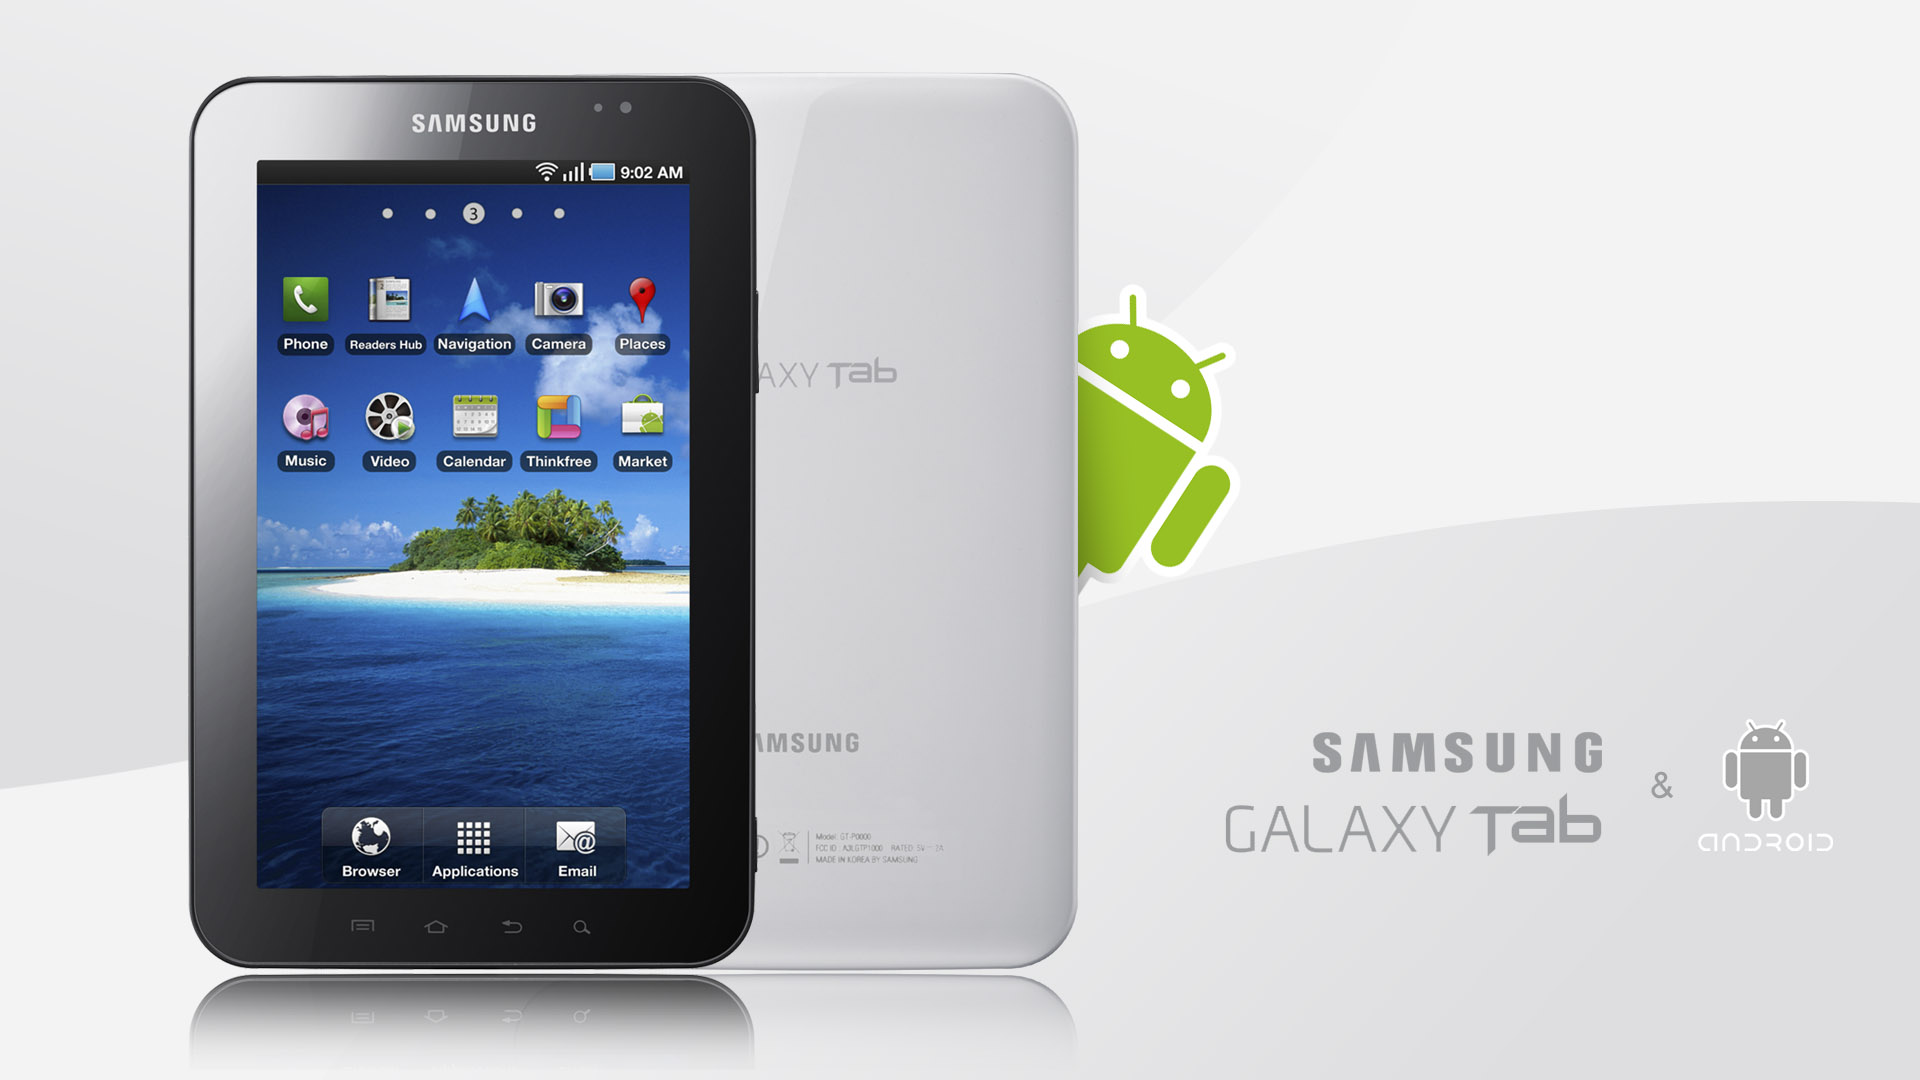 Samsung Galaxy Tab Android 1920x1080 HD Image Gadgets 1920x1080